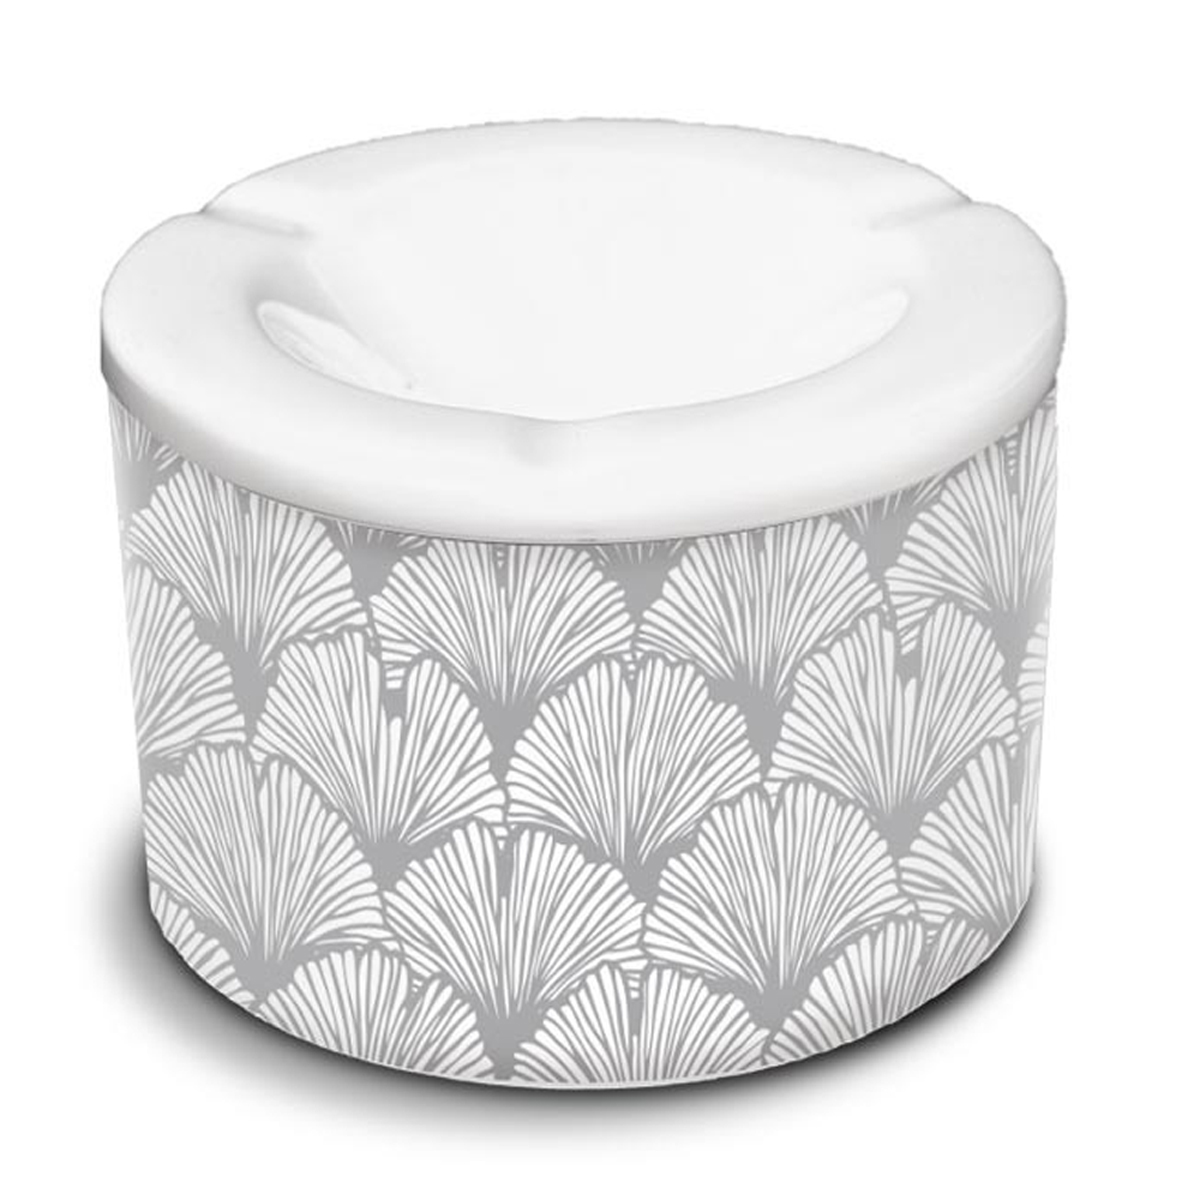 Cendrier marocain céramique \'Ginkgo Biloba\' gris - 10x7 cm - [A3154]